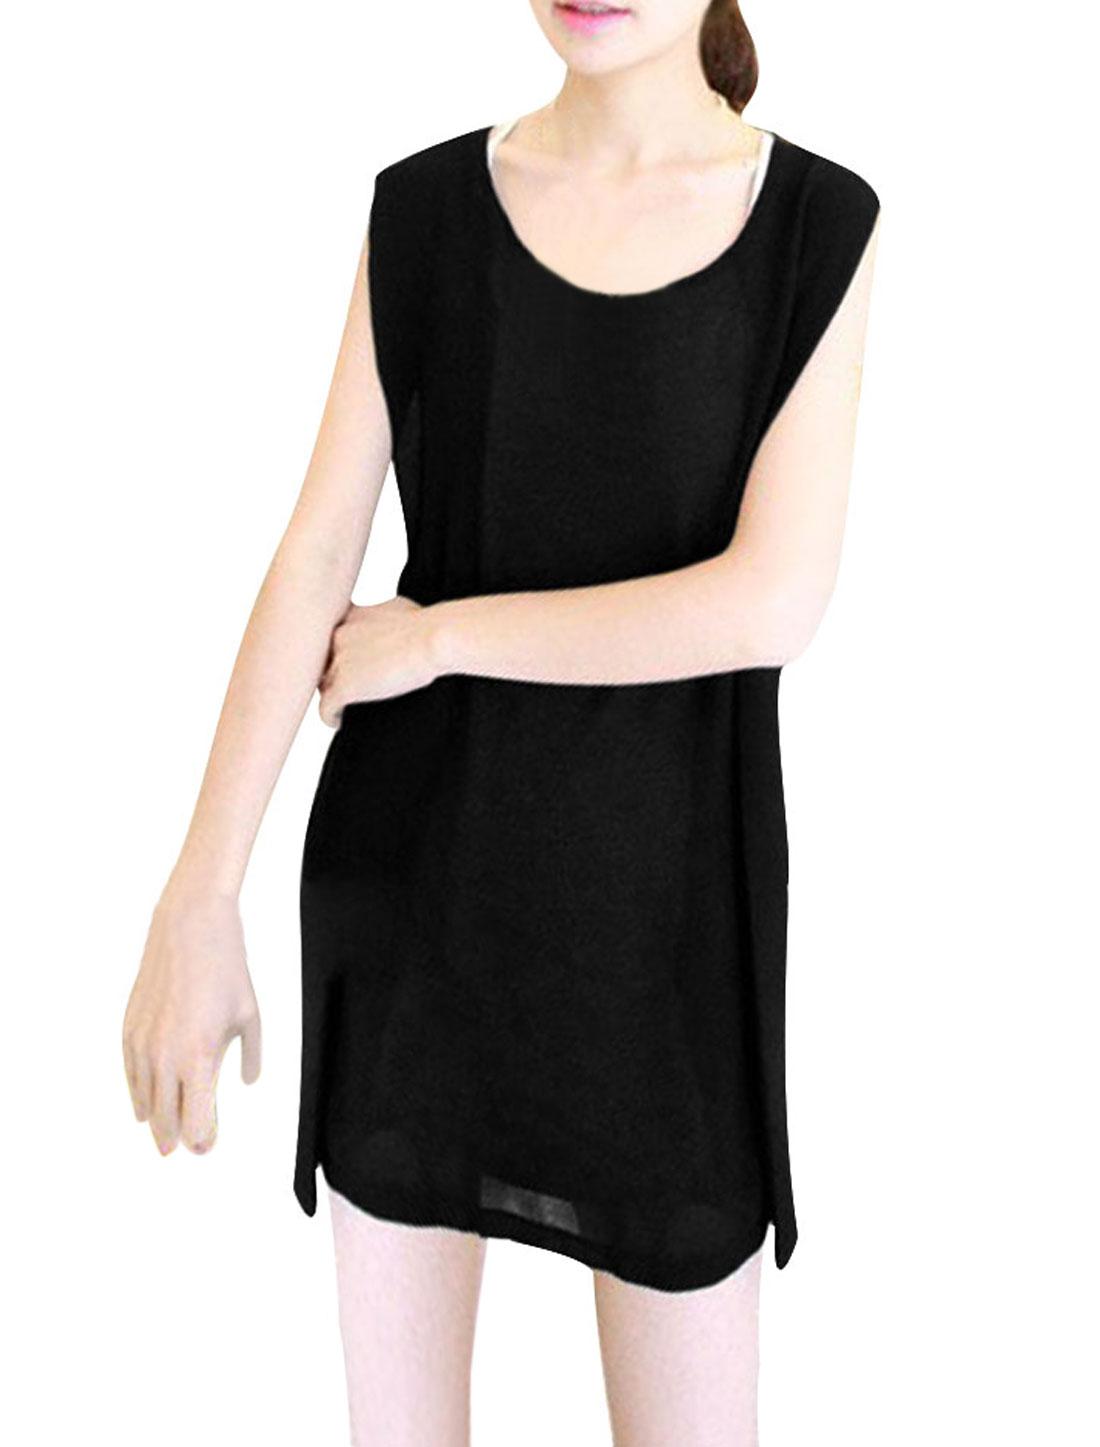 Ladies New Fashion Scoop Neck Black Gray Chiffon Splice Tunic Tank Tops XS